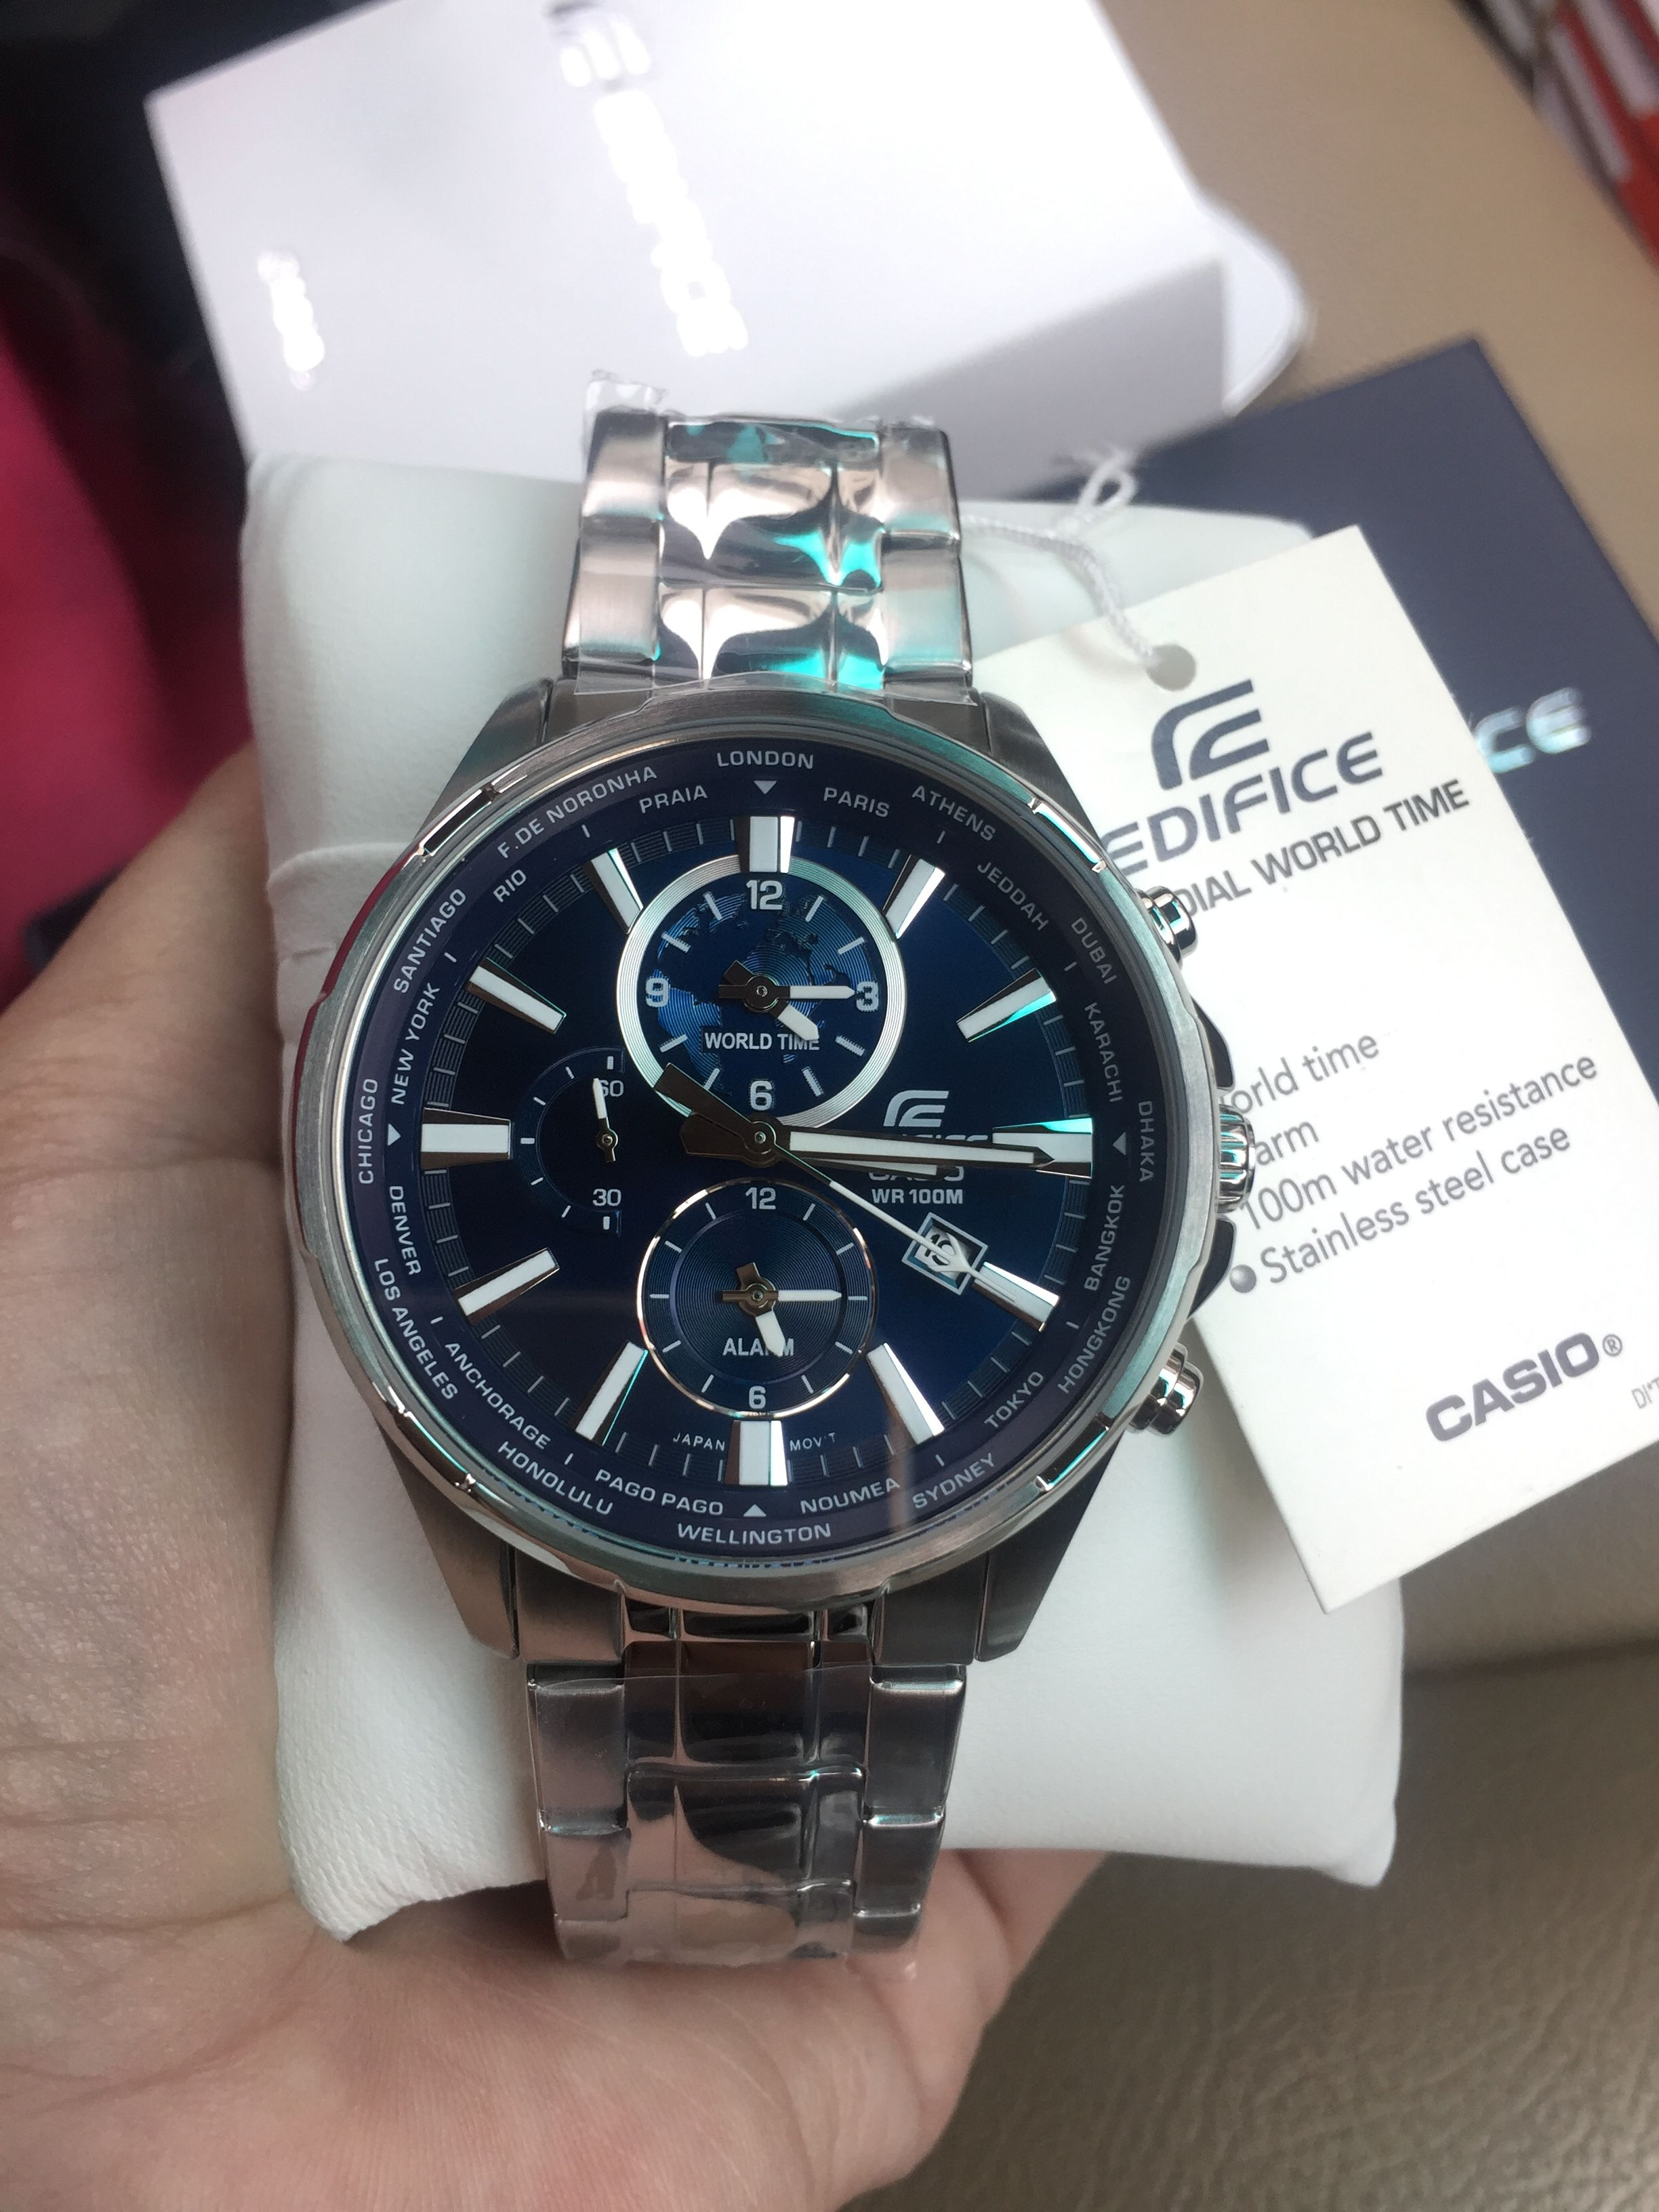 1d79f486fb16 นาฬิกาข้อมือ CASIO EDIFICE MULTI-HAND รุ่น EFR-304D-2AV นาฬิกาข้อมือ ...